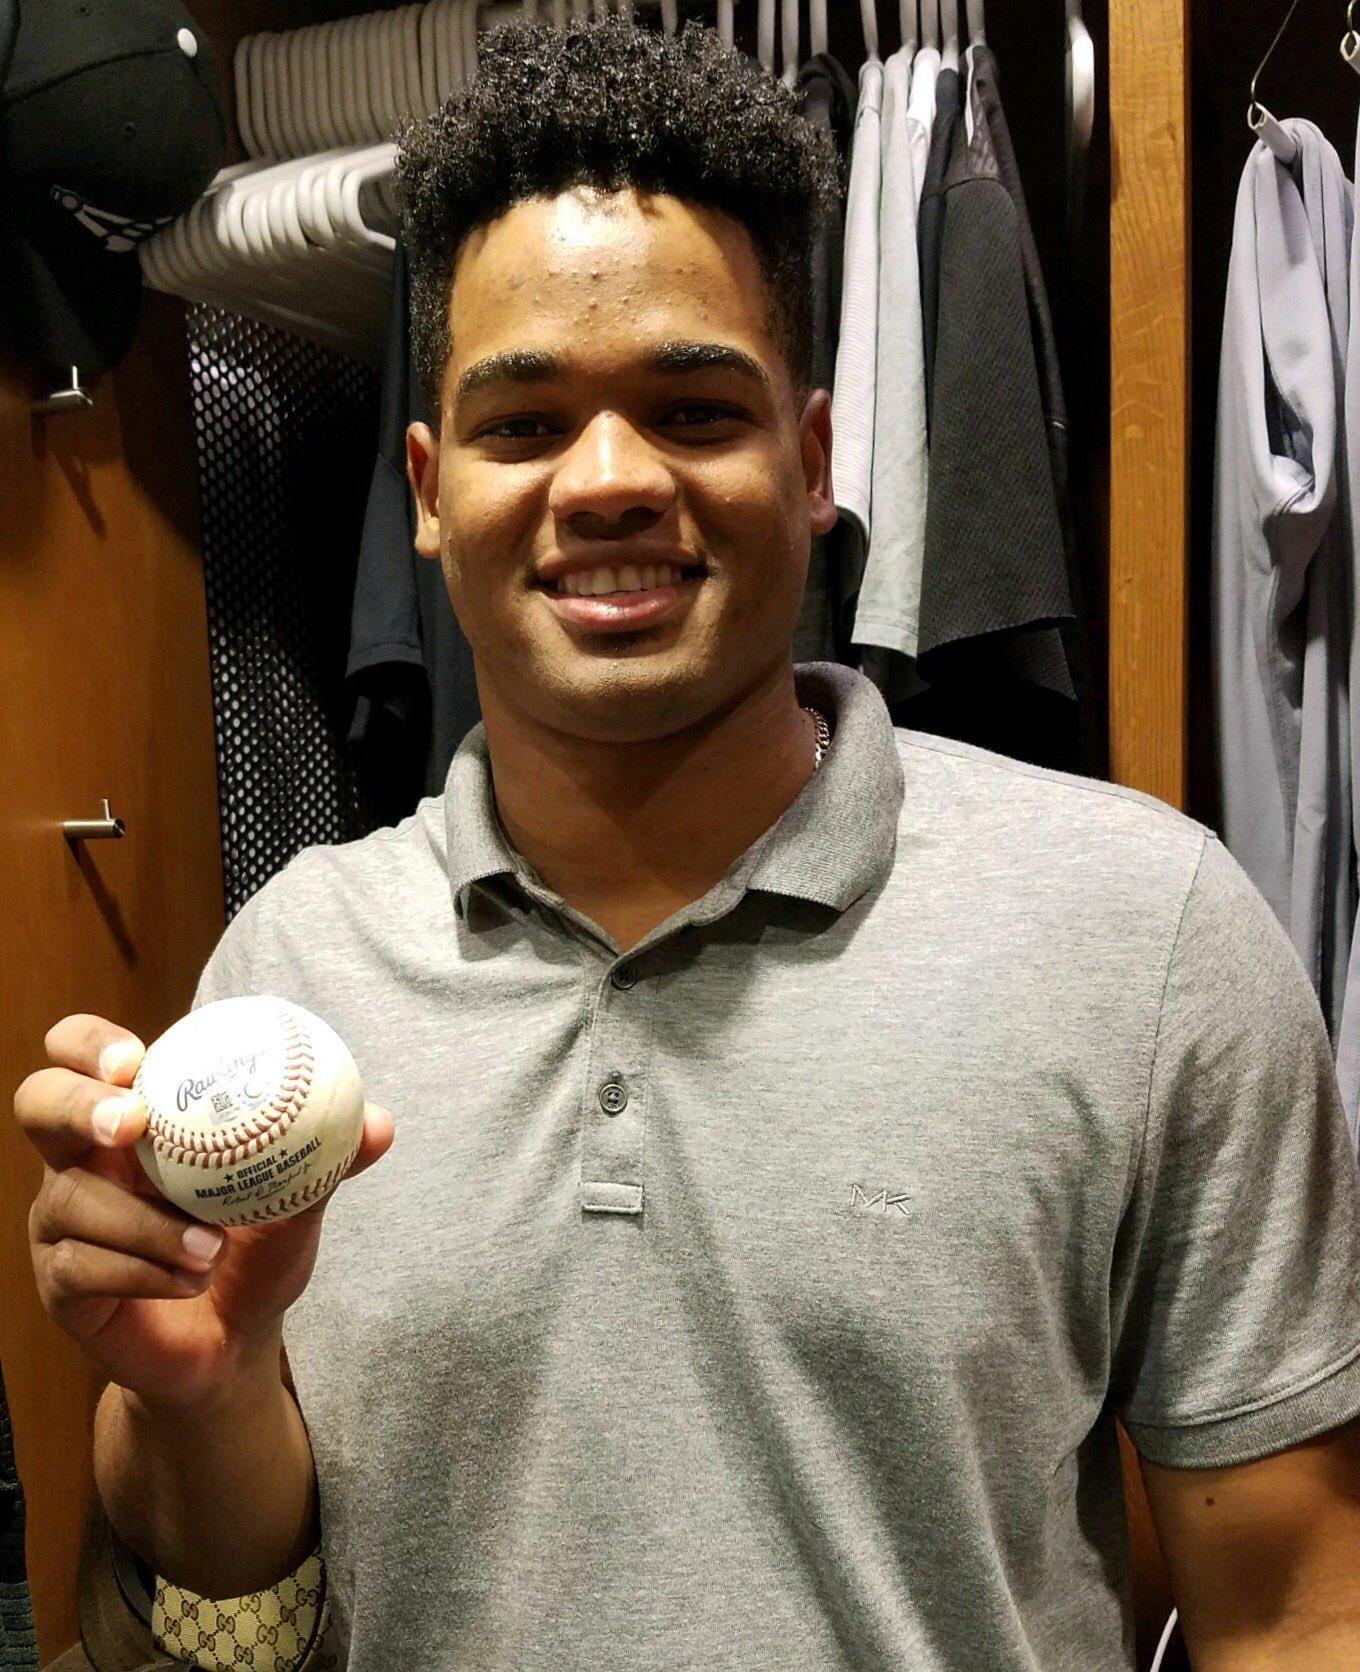 The baseball from his first strikeout in a White Sox uniform. Congrats, Reynaldo! https://t.co/LGpbzGqqWq